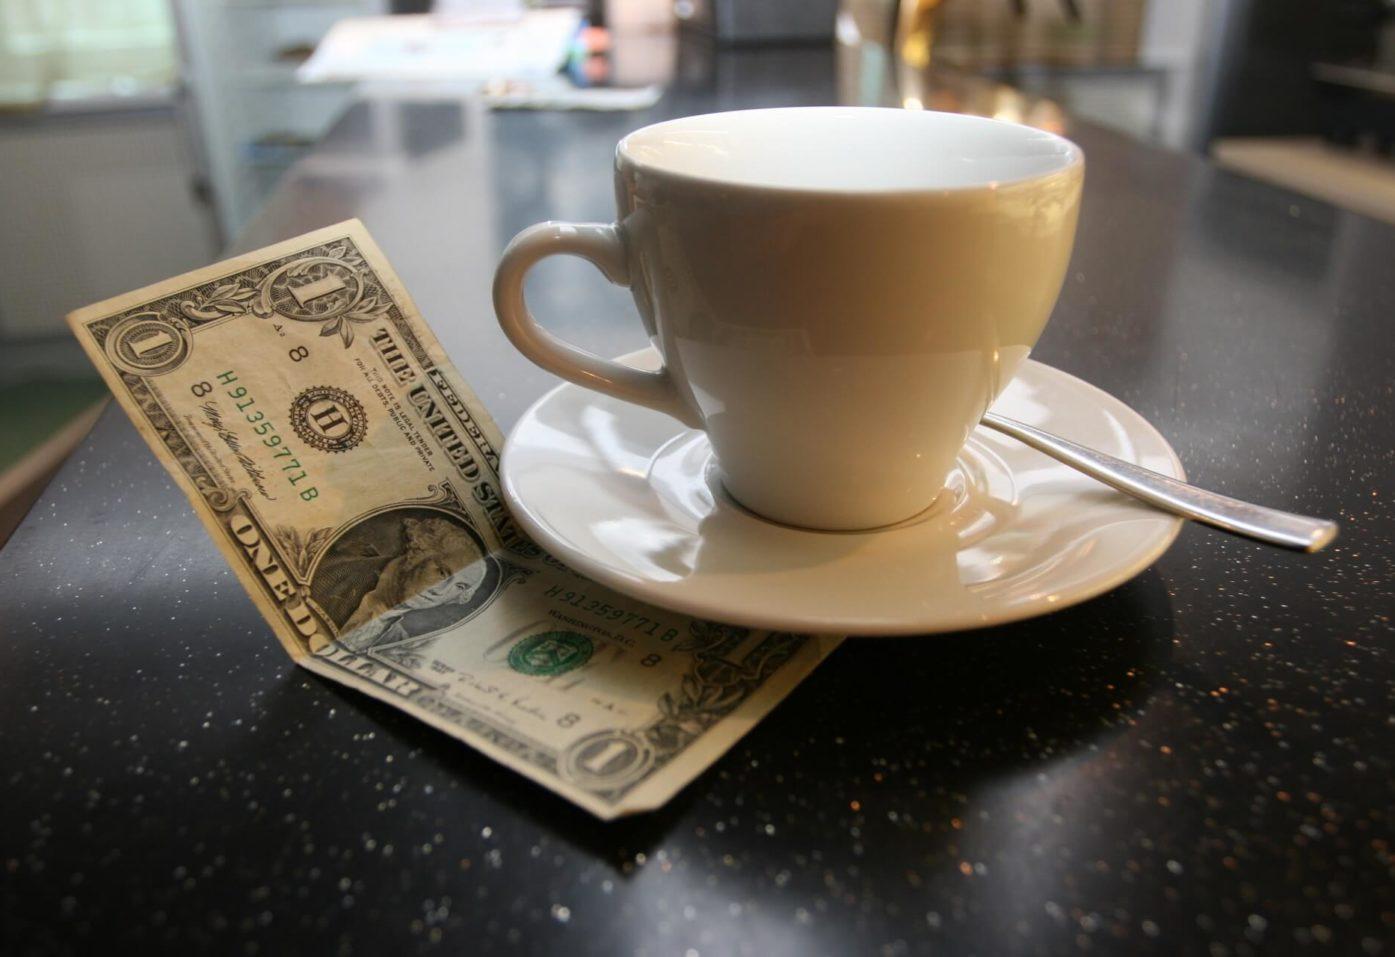 Средняя сумма электронных чаевых в ресторанах – 260 рублей